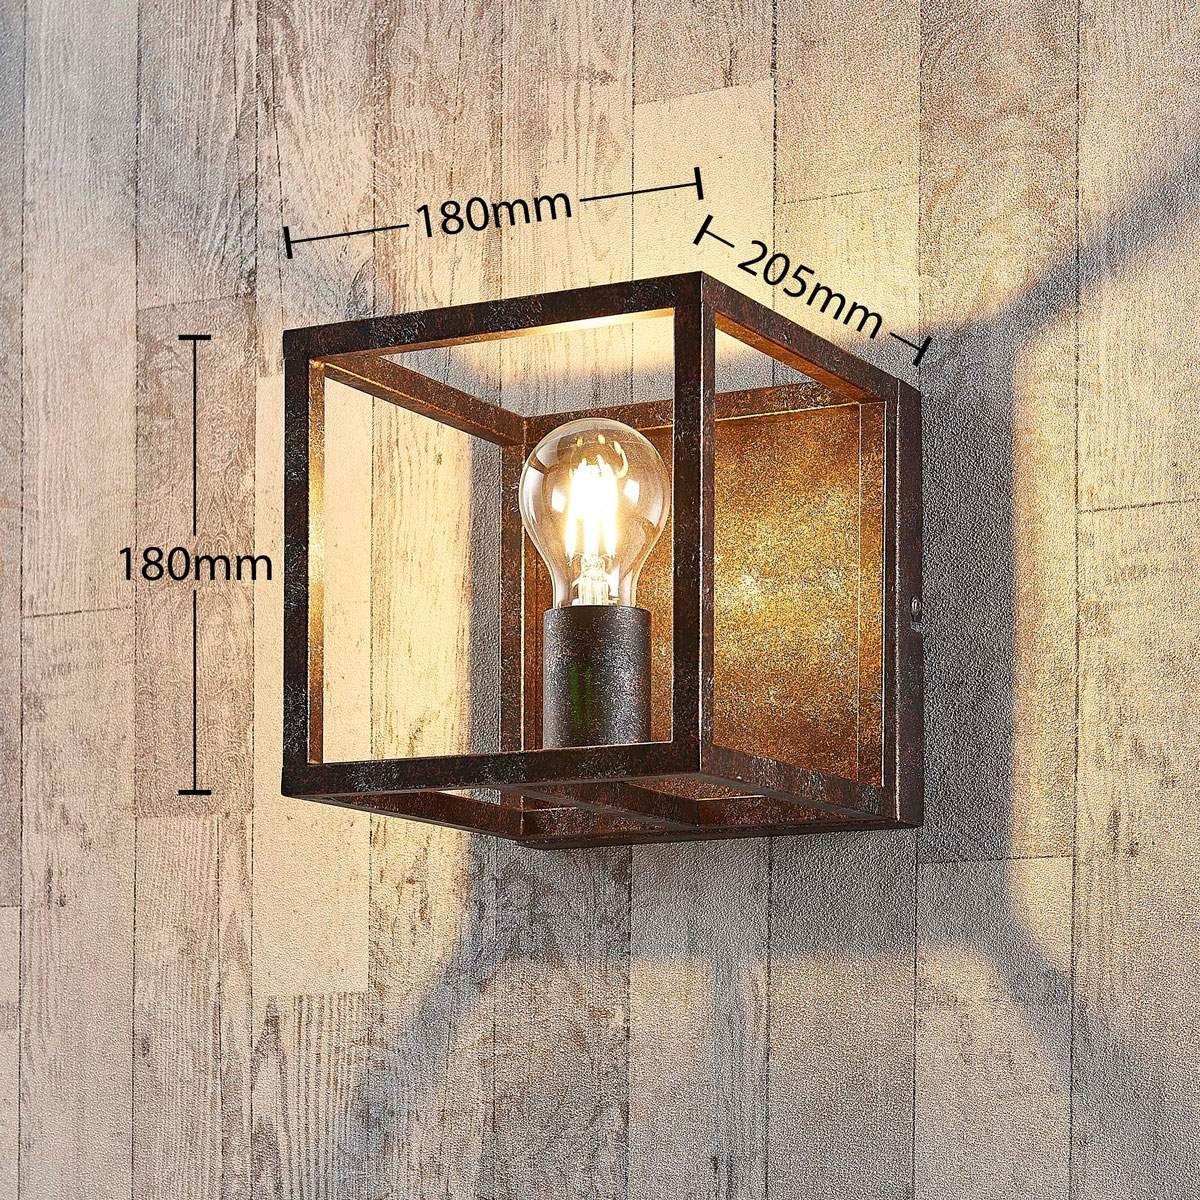 Landhaus Wandleuchte Von Lindby Braun Lampen Wandbeleuchtung